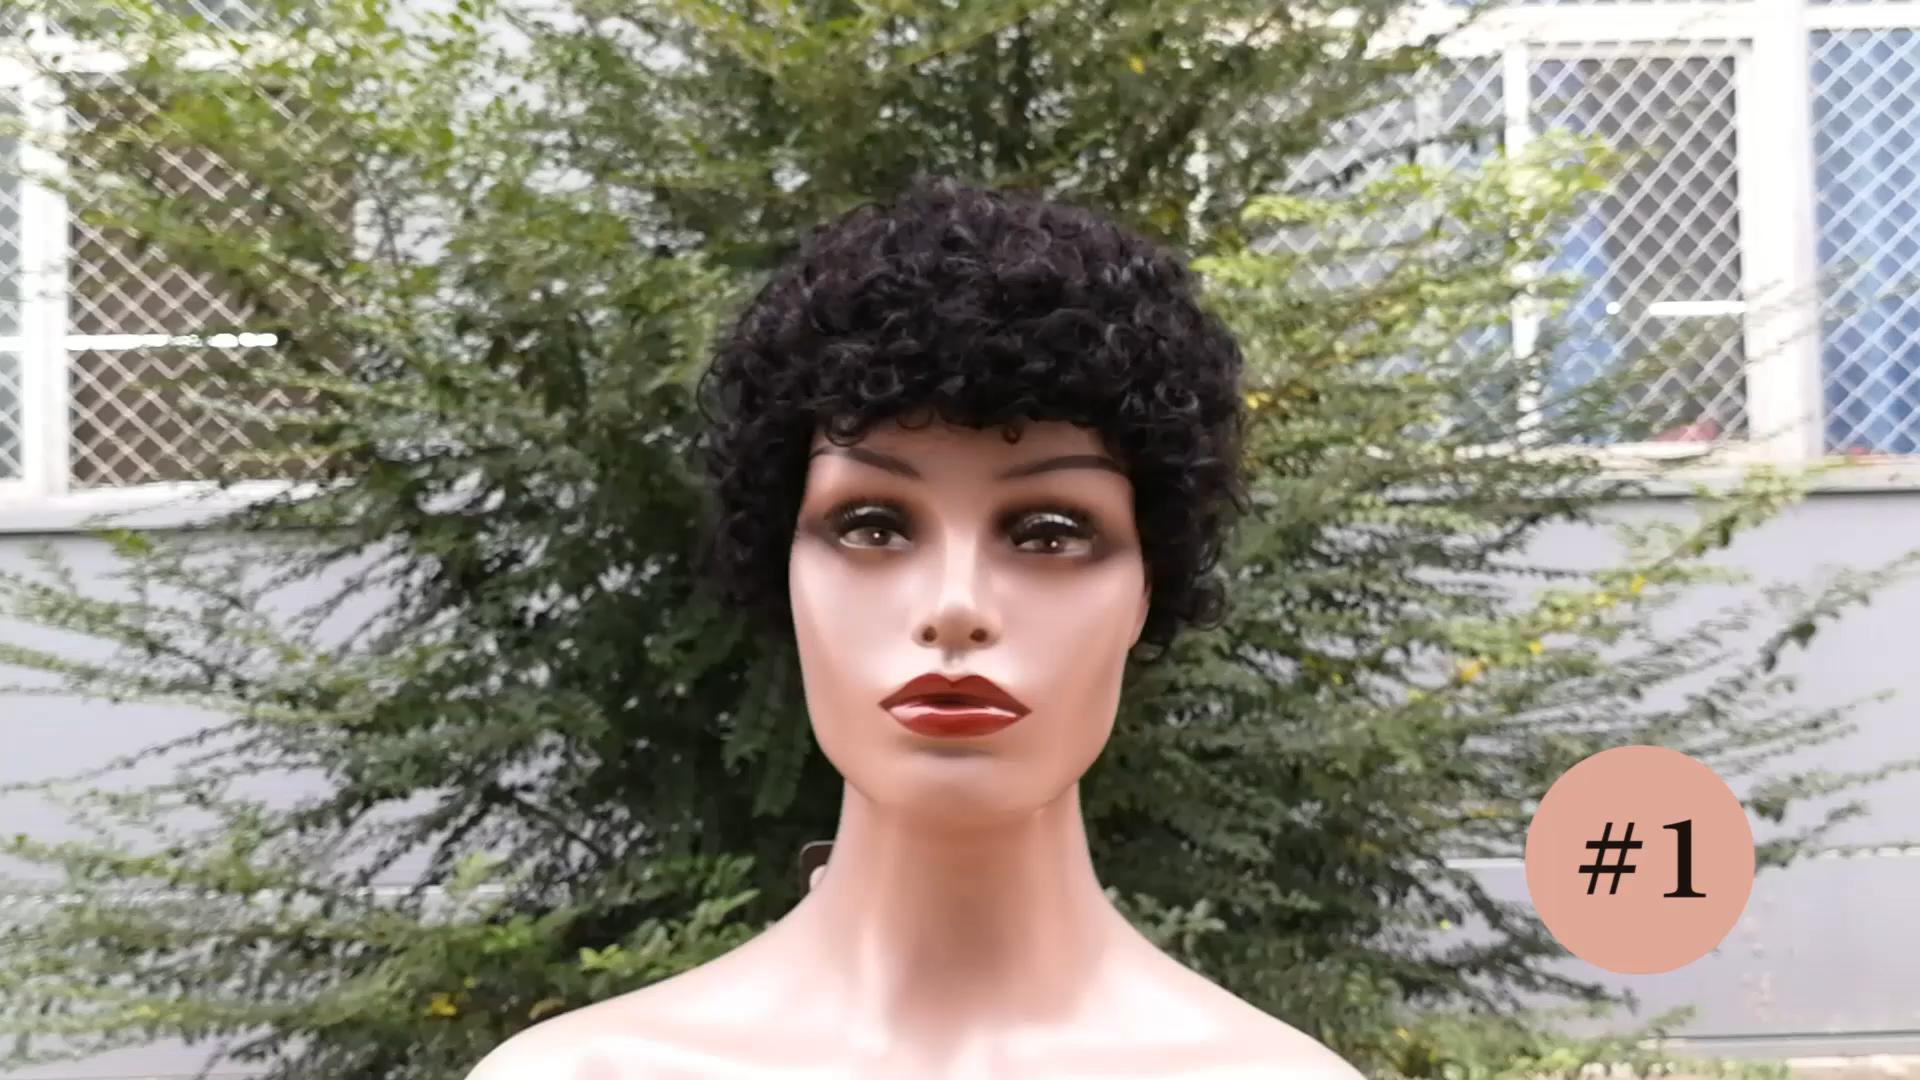 Lida Wig Rambut Manusia Pendek Jerry Ikal 100% Rambut Manusia Peru 6631 Wig Afro Pixie